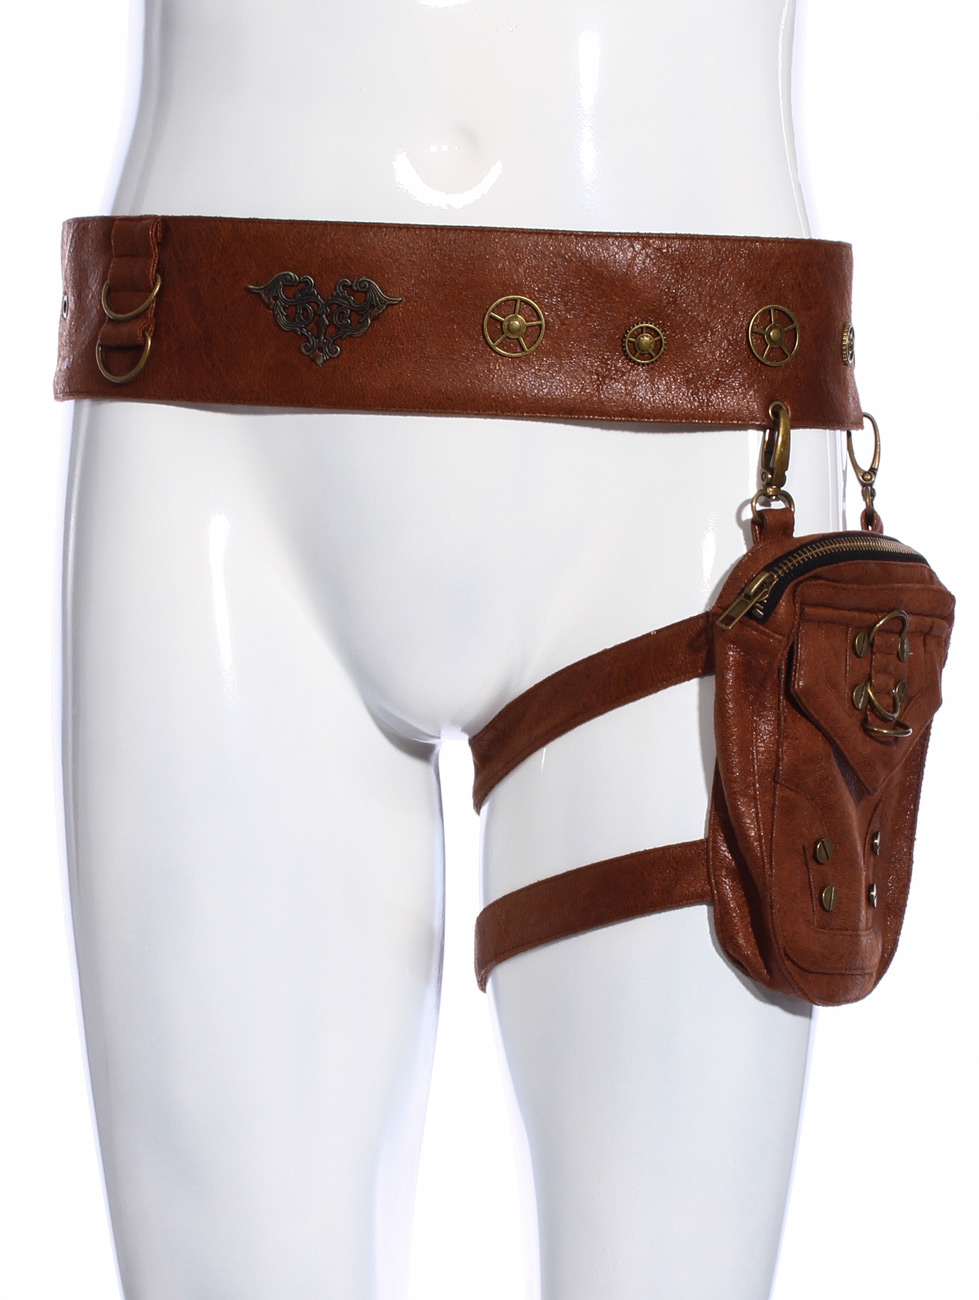 Ceinture harnais de jambe homme imitation cuir marron avec poche, steampunk  RQBL 2662b61e67a